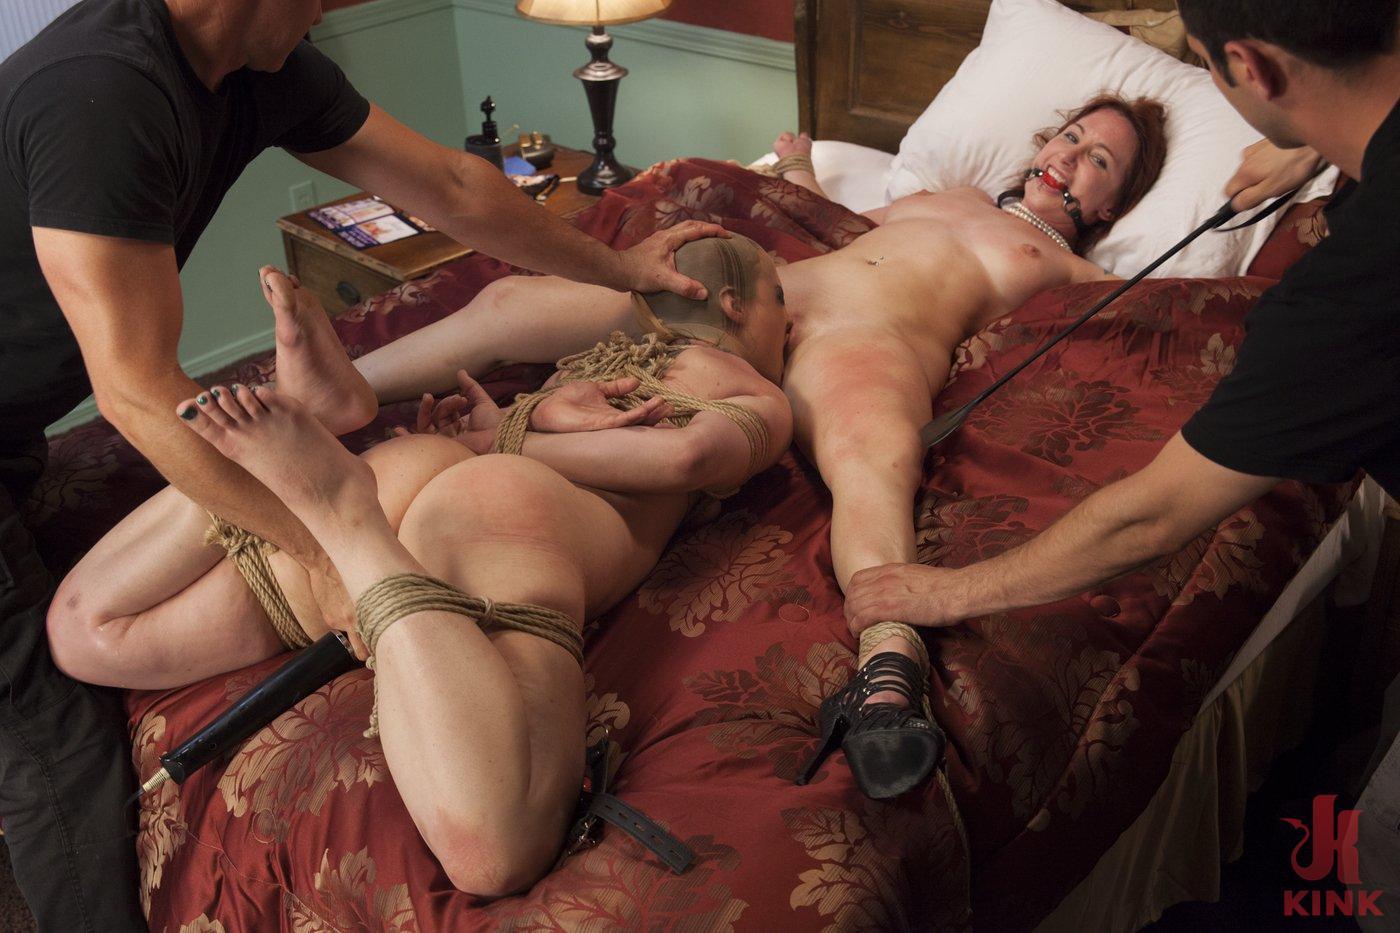 Casey calvert gets anal rx from doctor amp his big dock helper 5